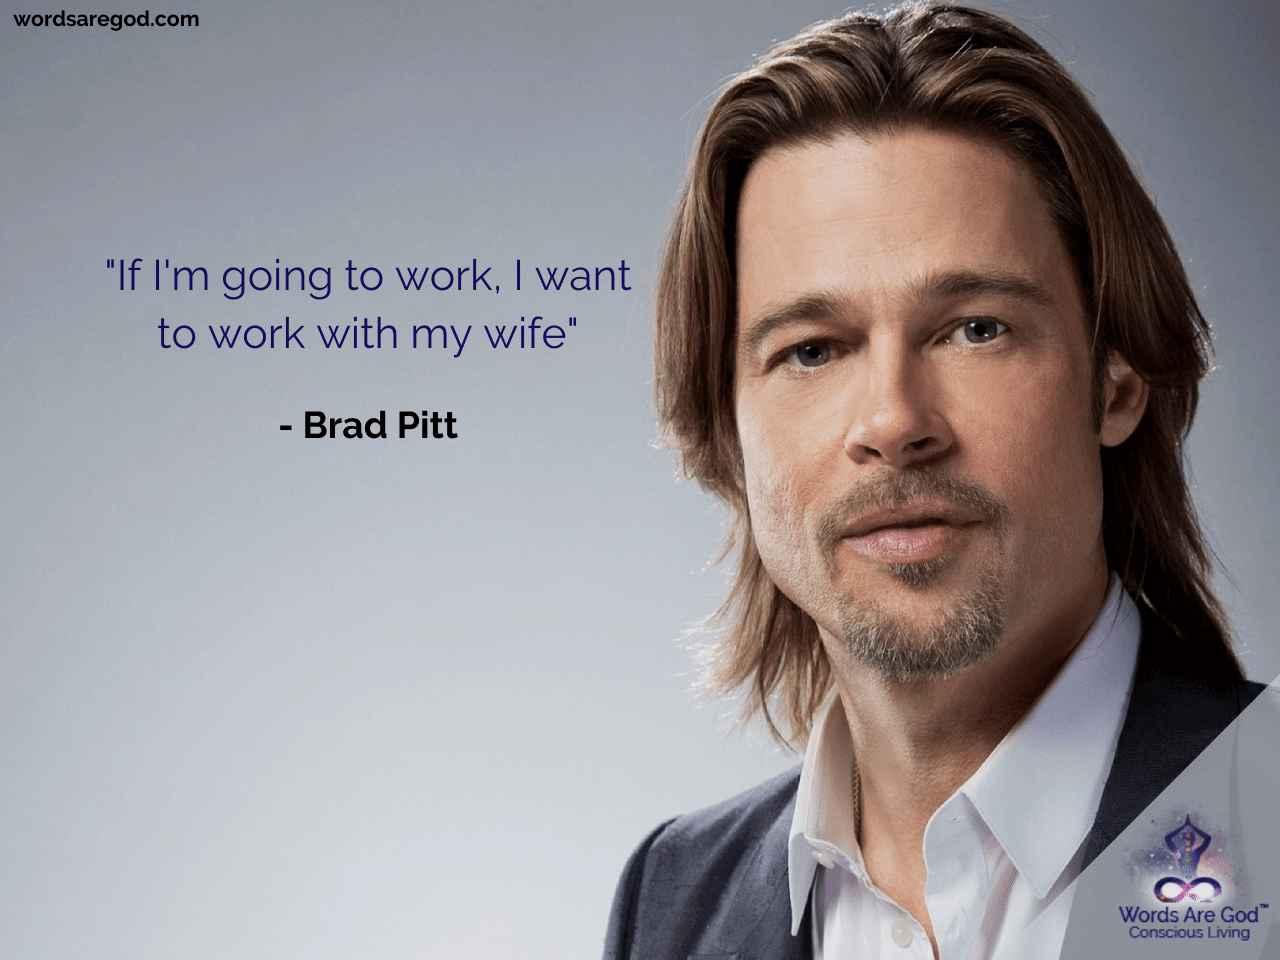 Brad Pitt Life Quote